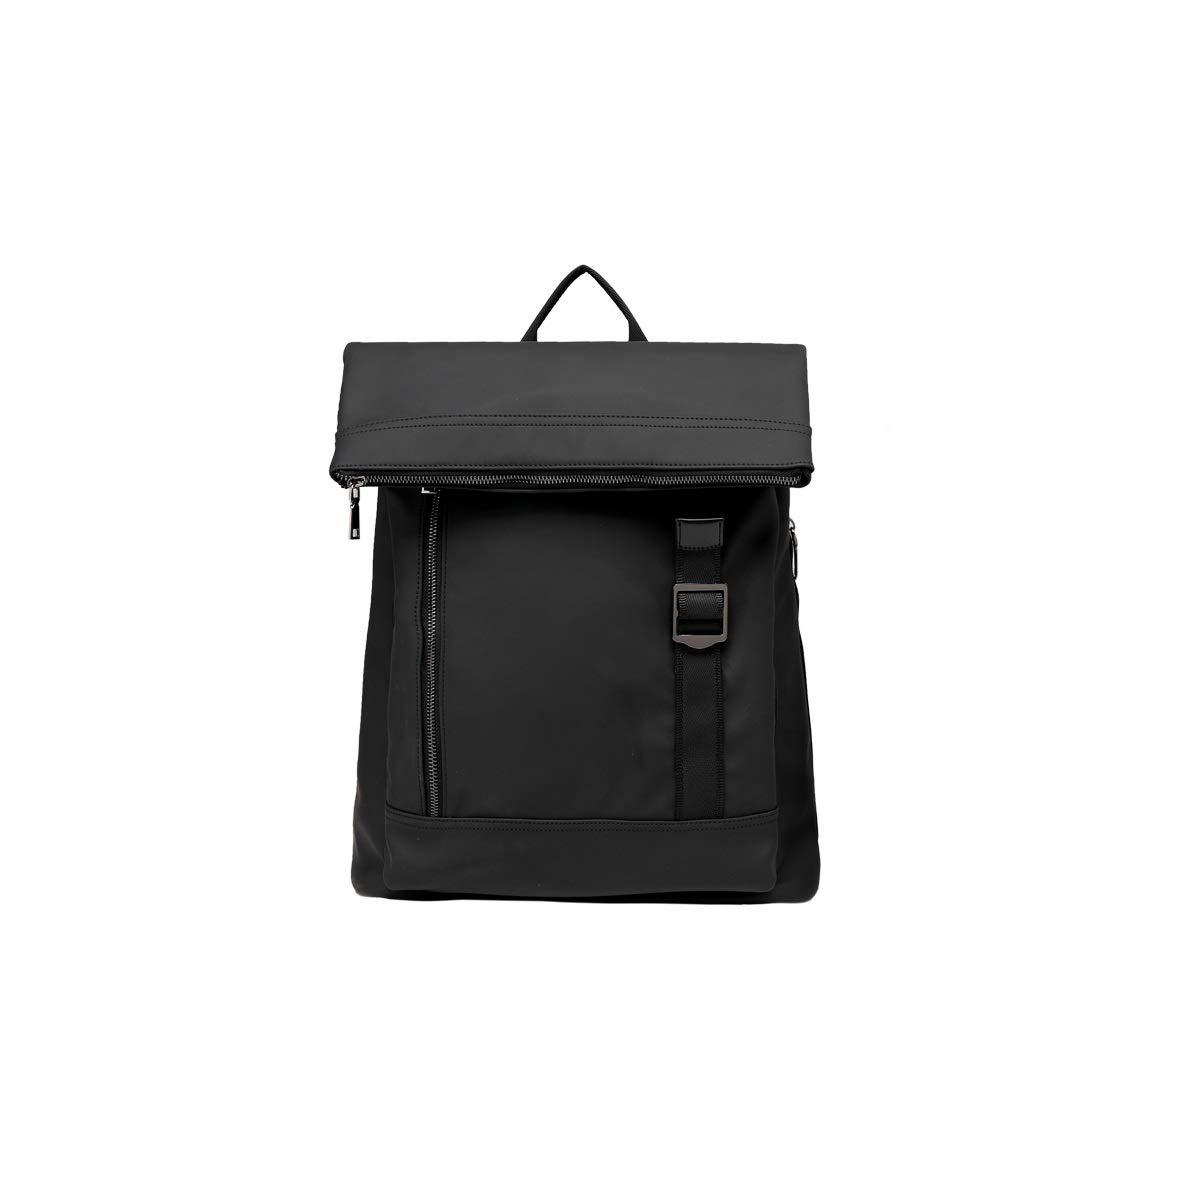 TONGBOSHI Backpack Men's Fashion Trend, Small Nylon Leisure Travel Bag, Large Capacity Student Bag Female Backpack (Black) (Color : Black)